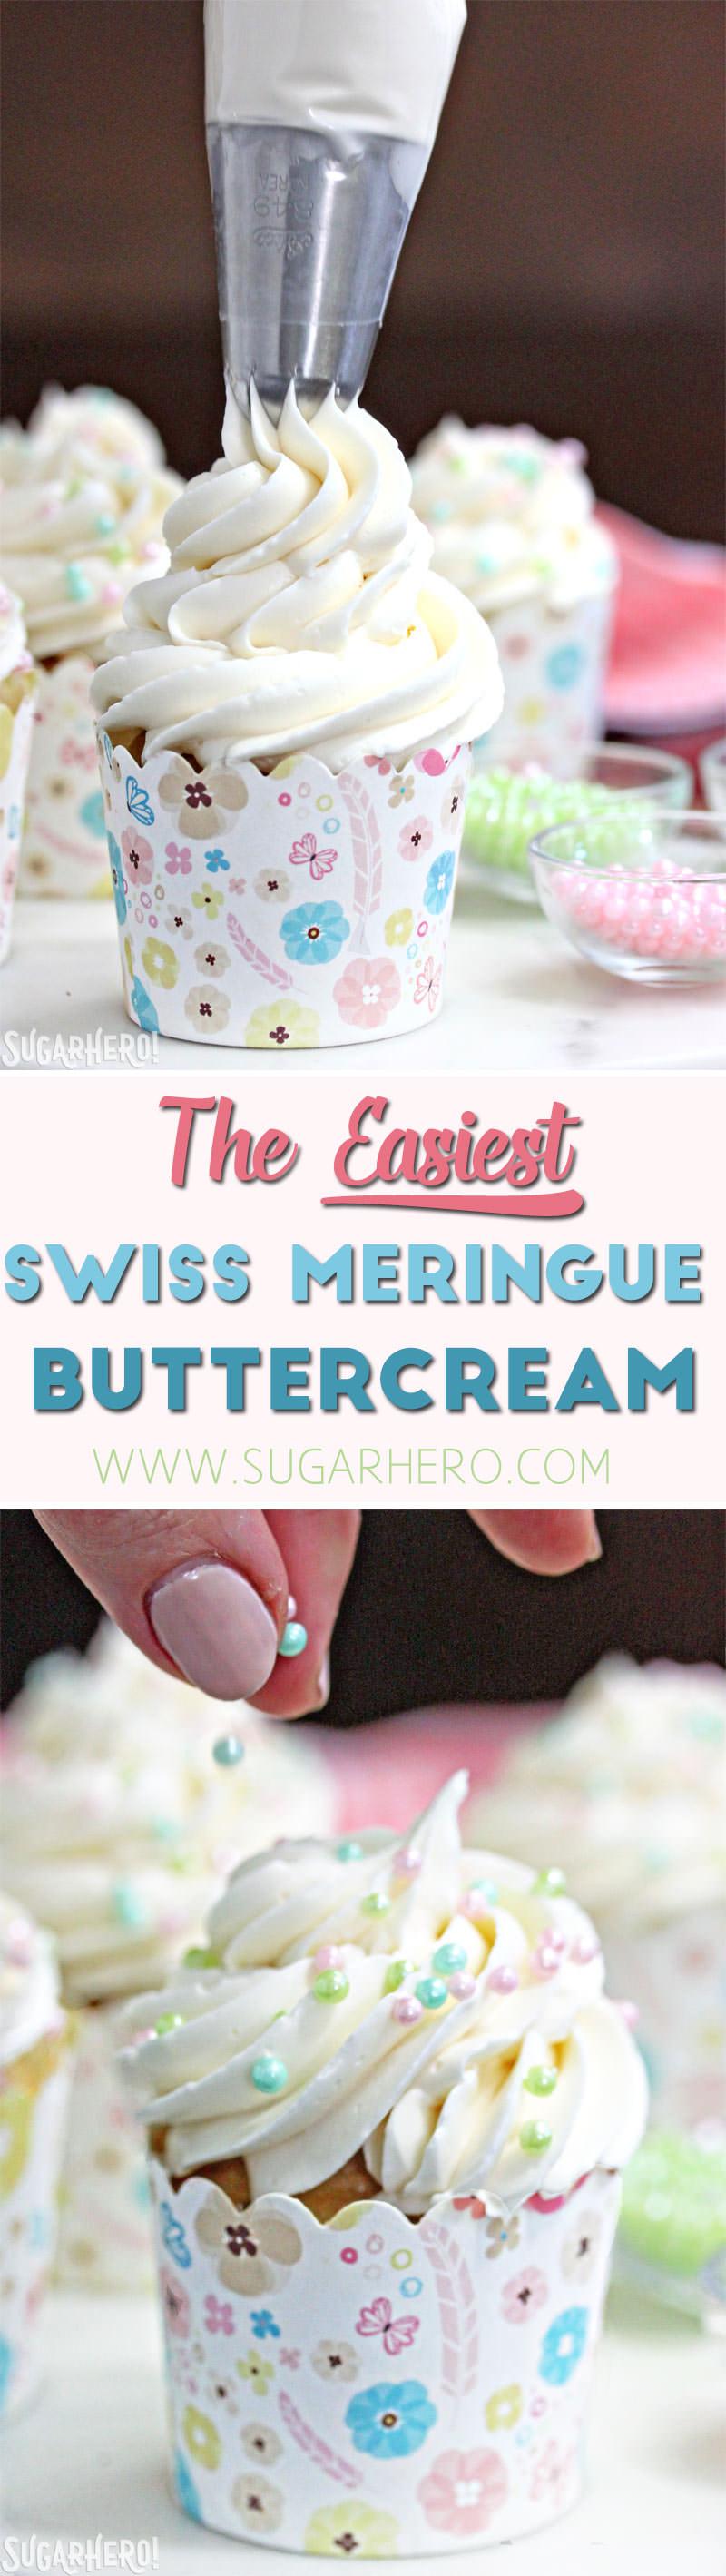 The EASIEST Swiss Meringue Buttercream Recipe! | From SugarHero.com